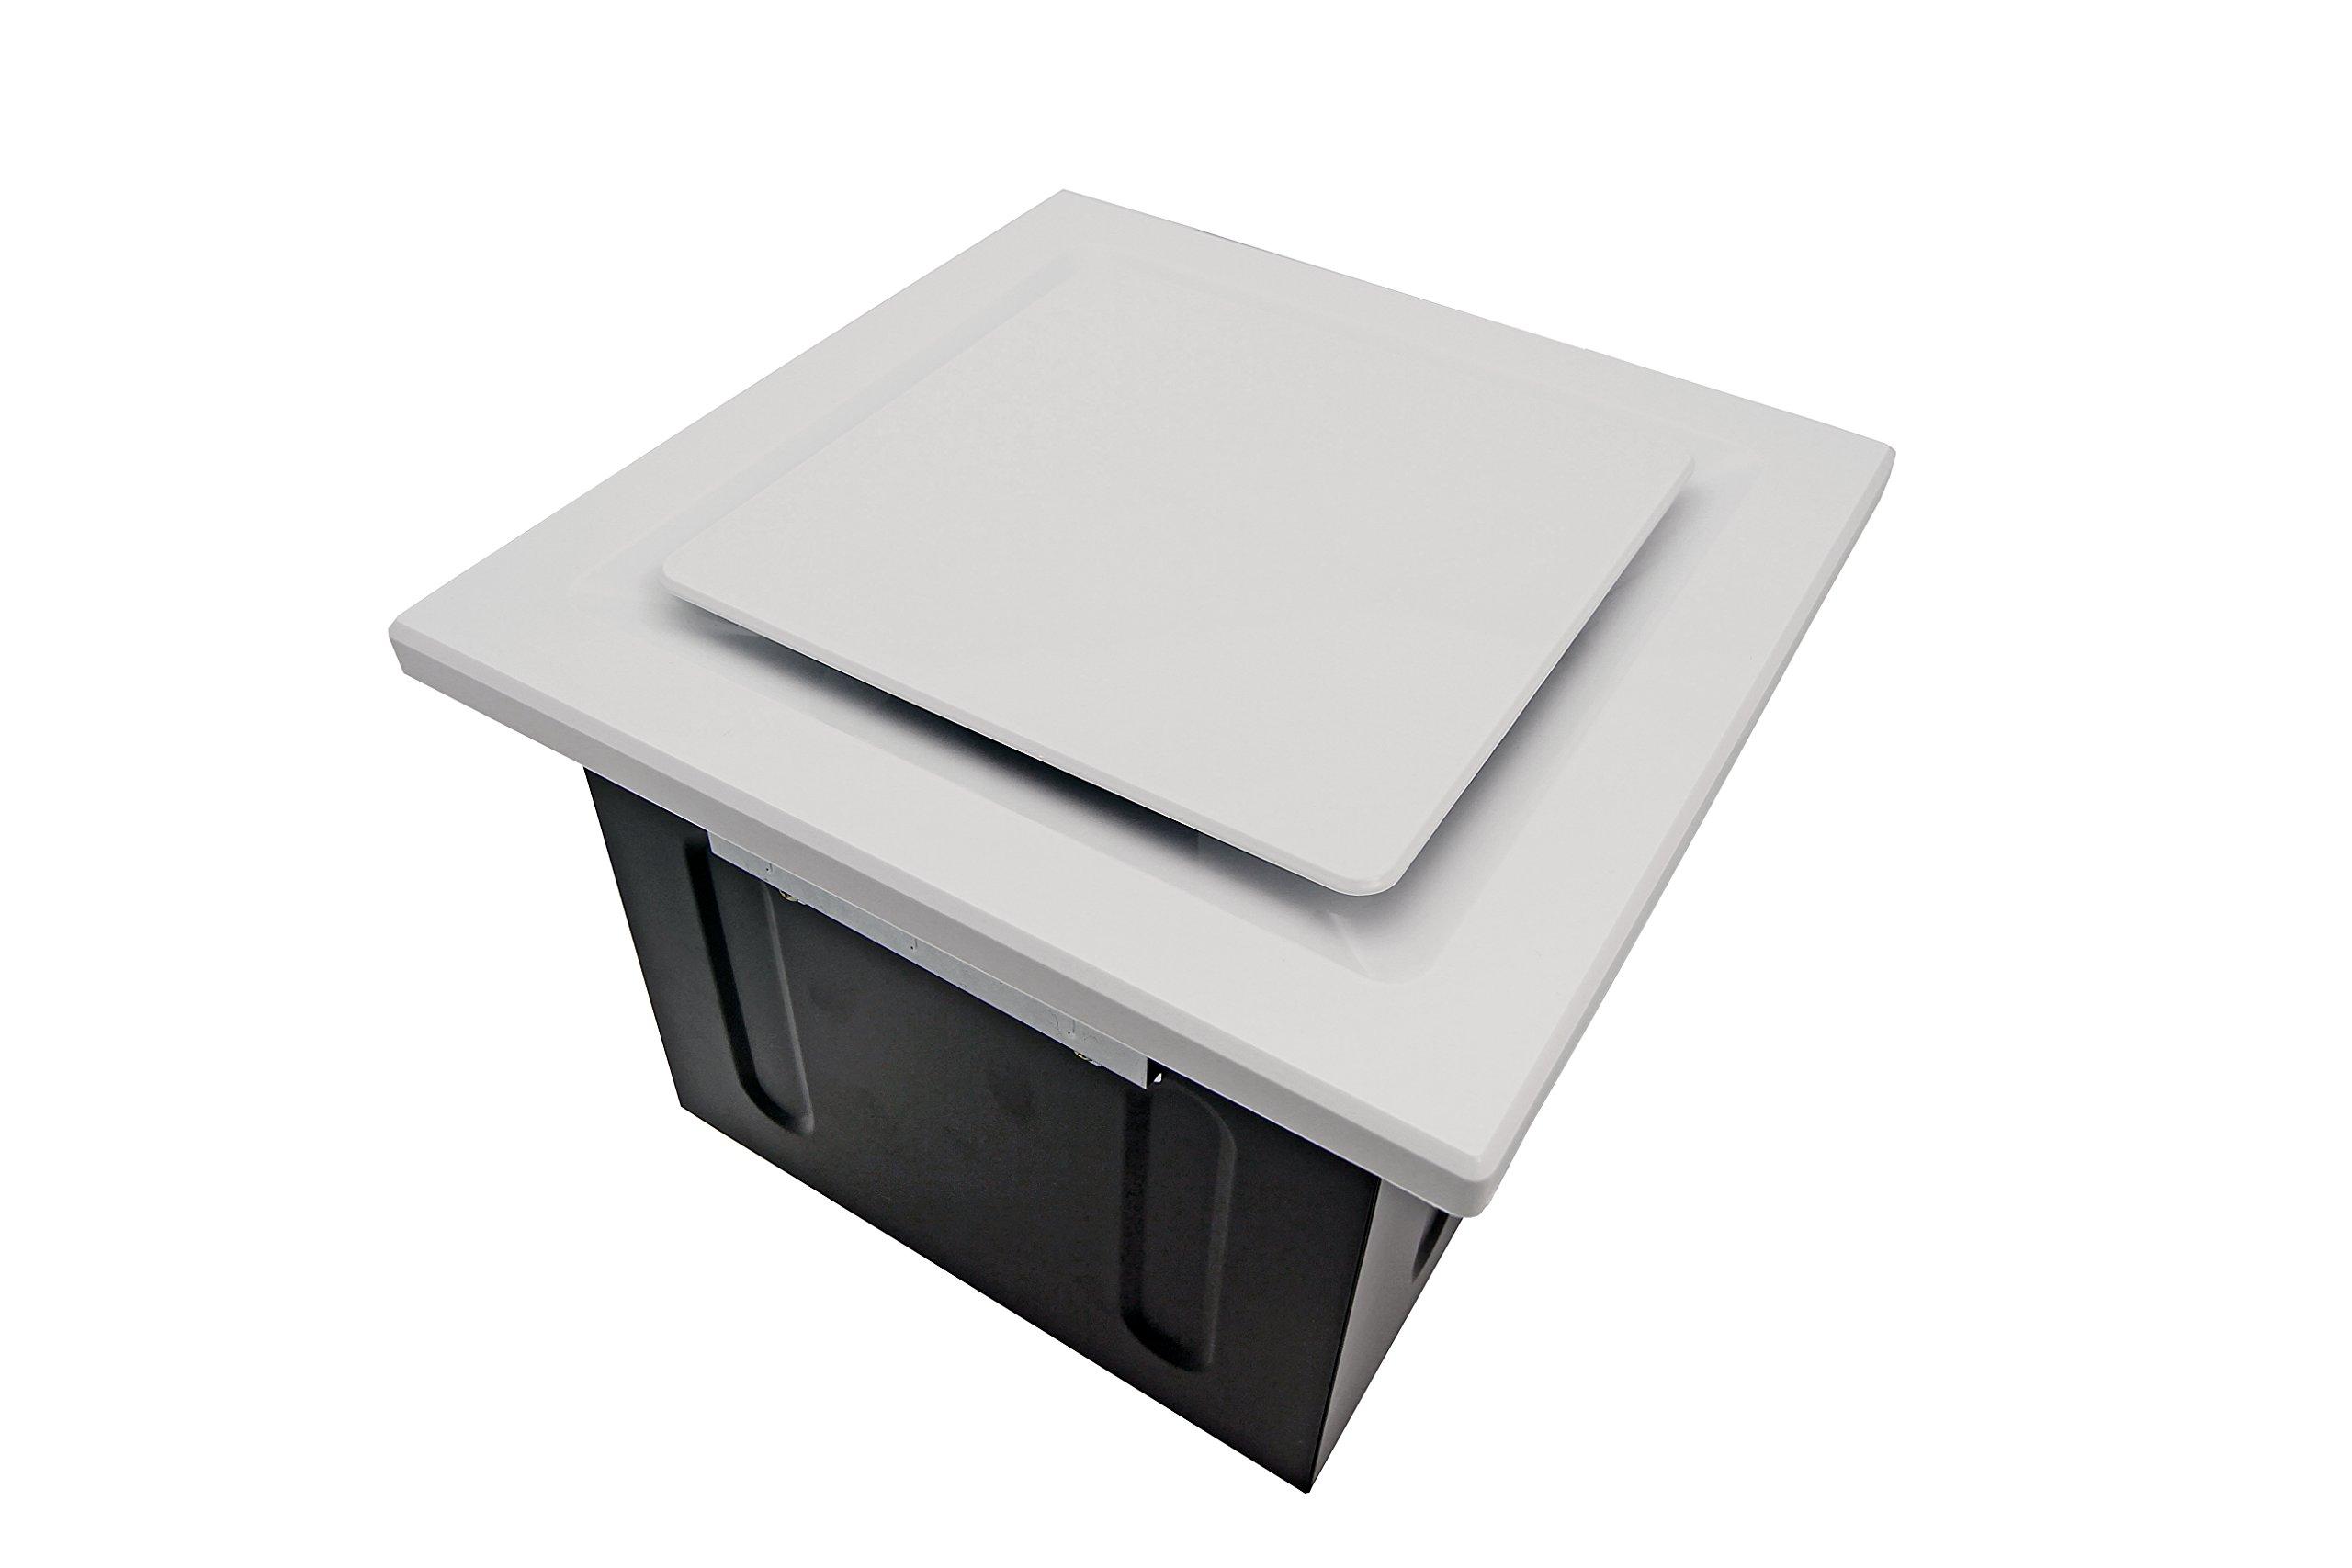 Aero Pure SBF 80 G5 W 80-CFM Super Quiet Bathroom Ventilation Fan, Energy Star Qualified, White